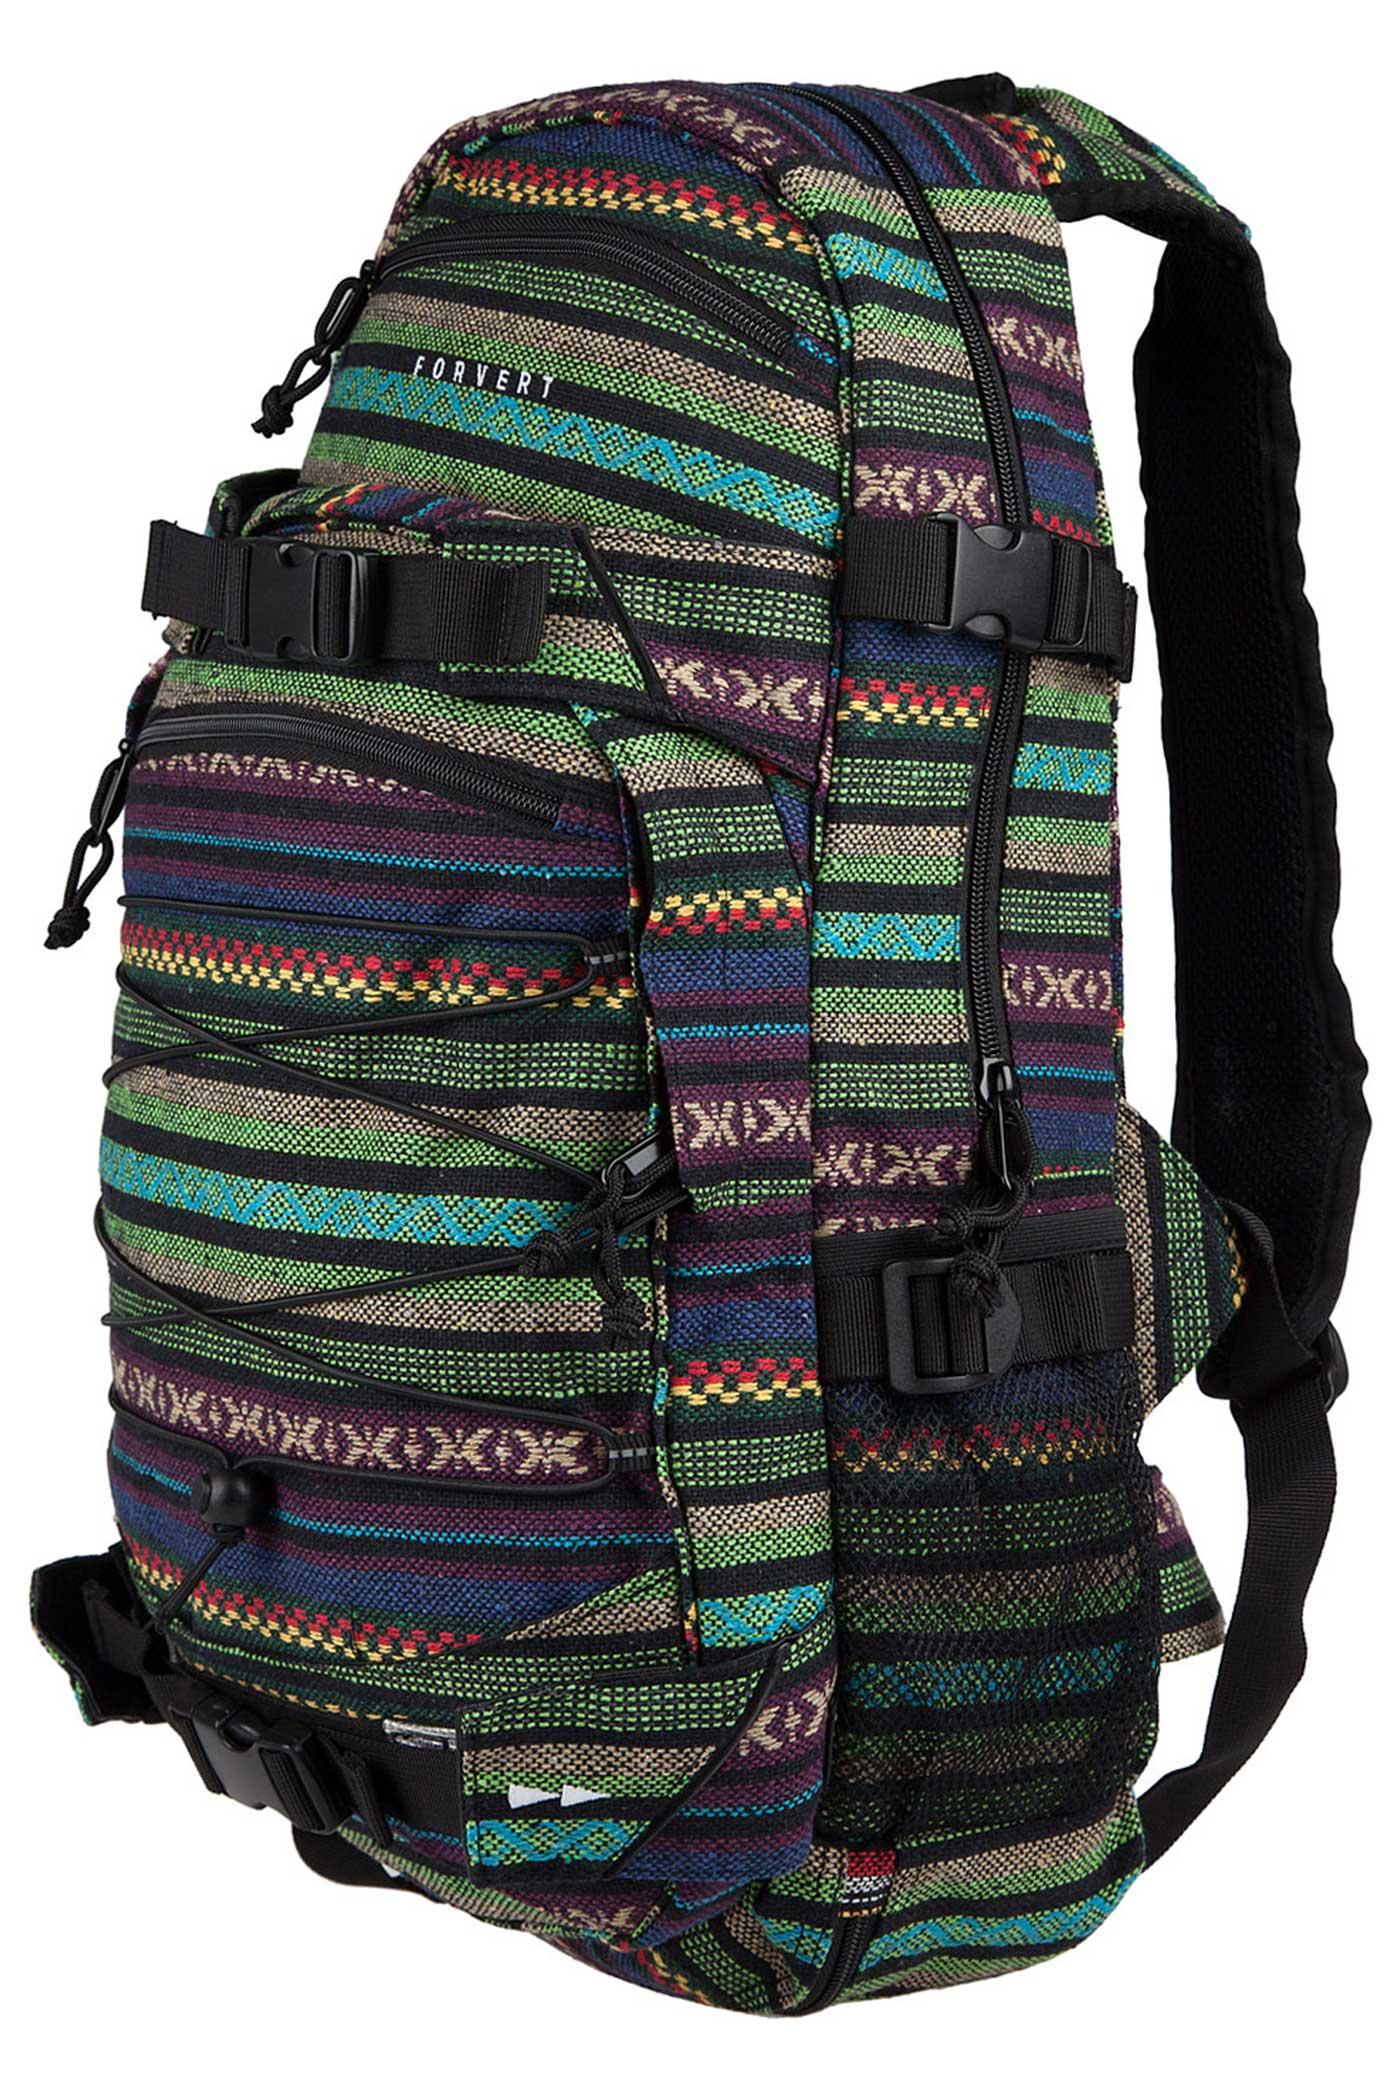 forvert new louis backpack 20l inka 2 buy at skatedeluxe. Black Bedroom Furniture Sets. Home Design Ideas